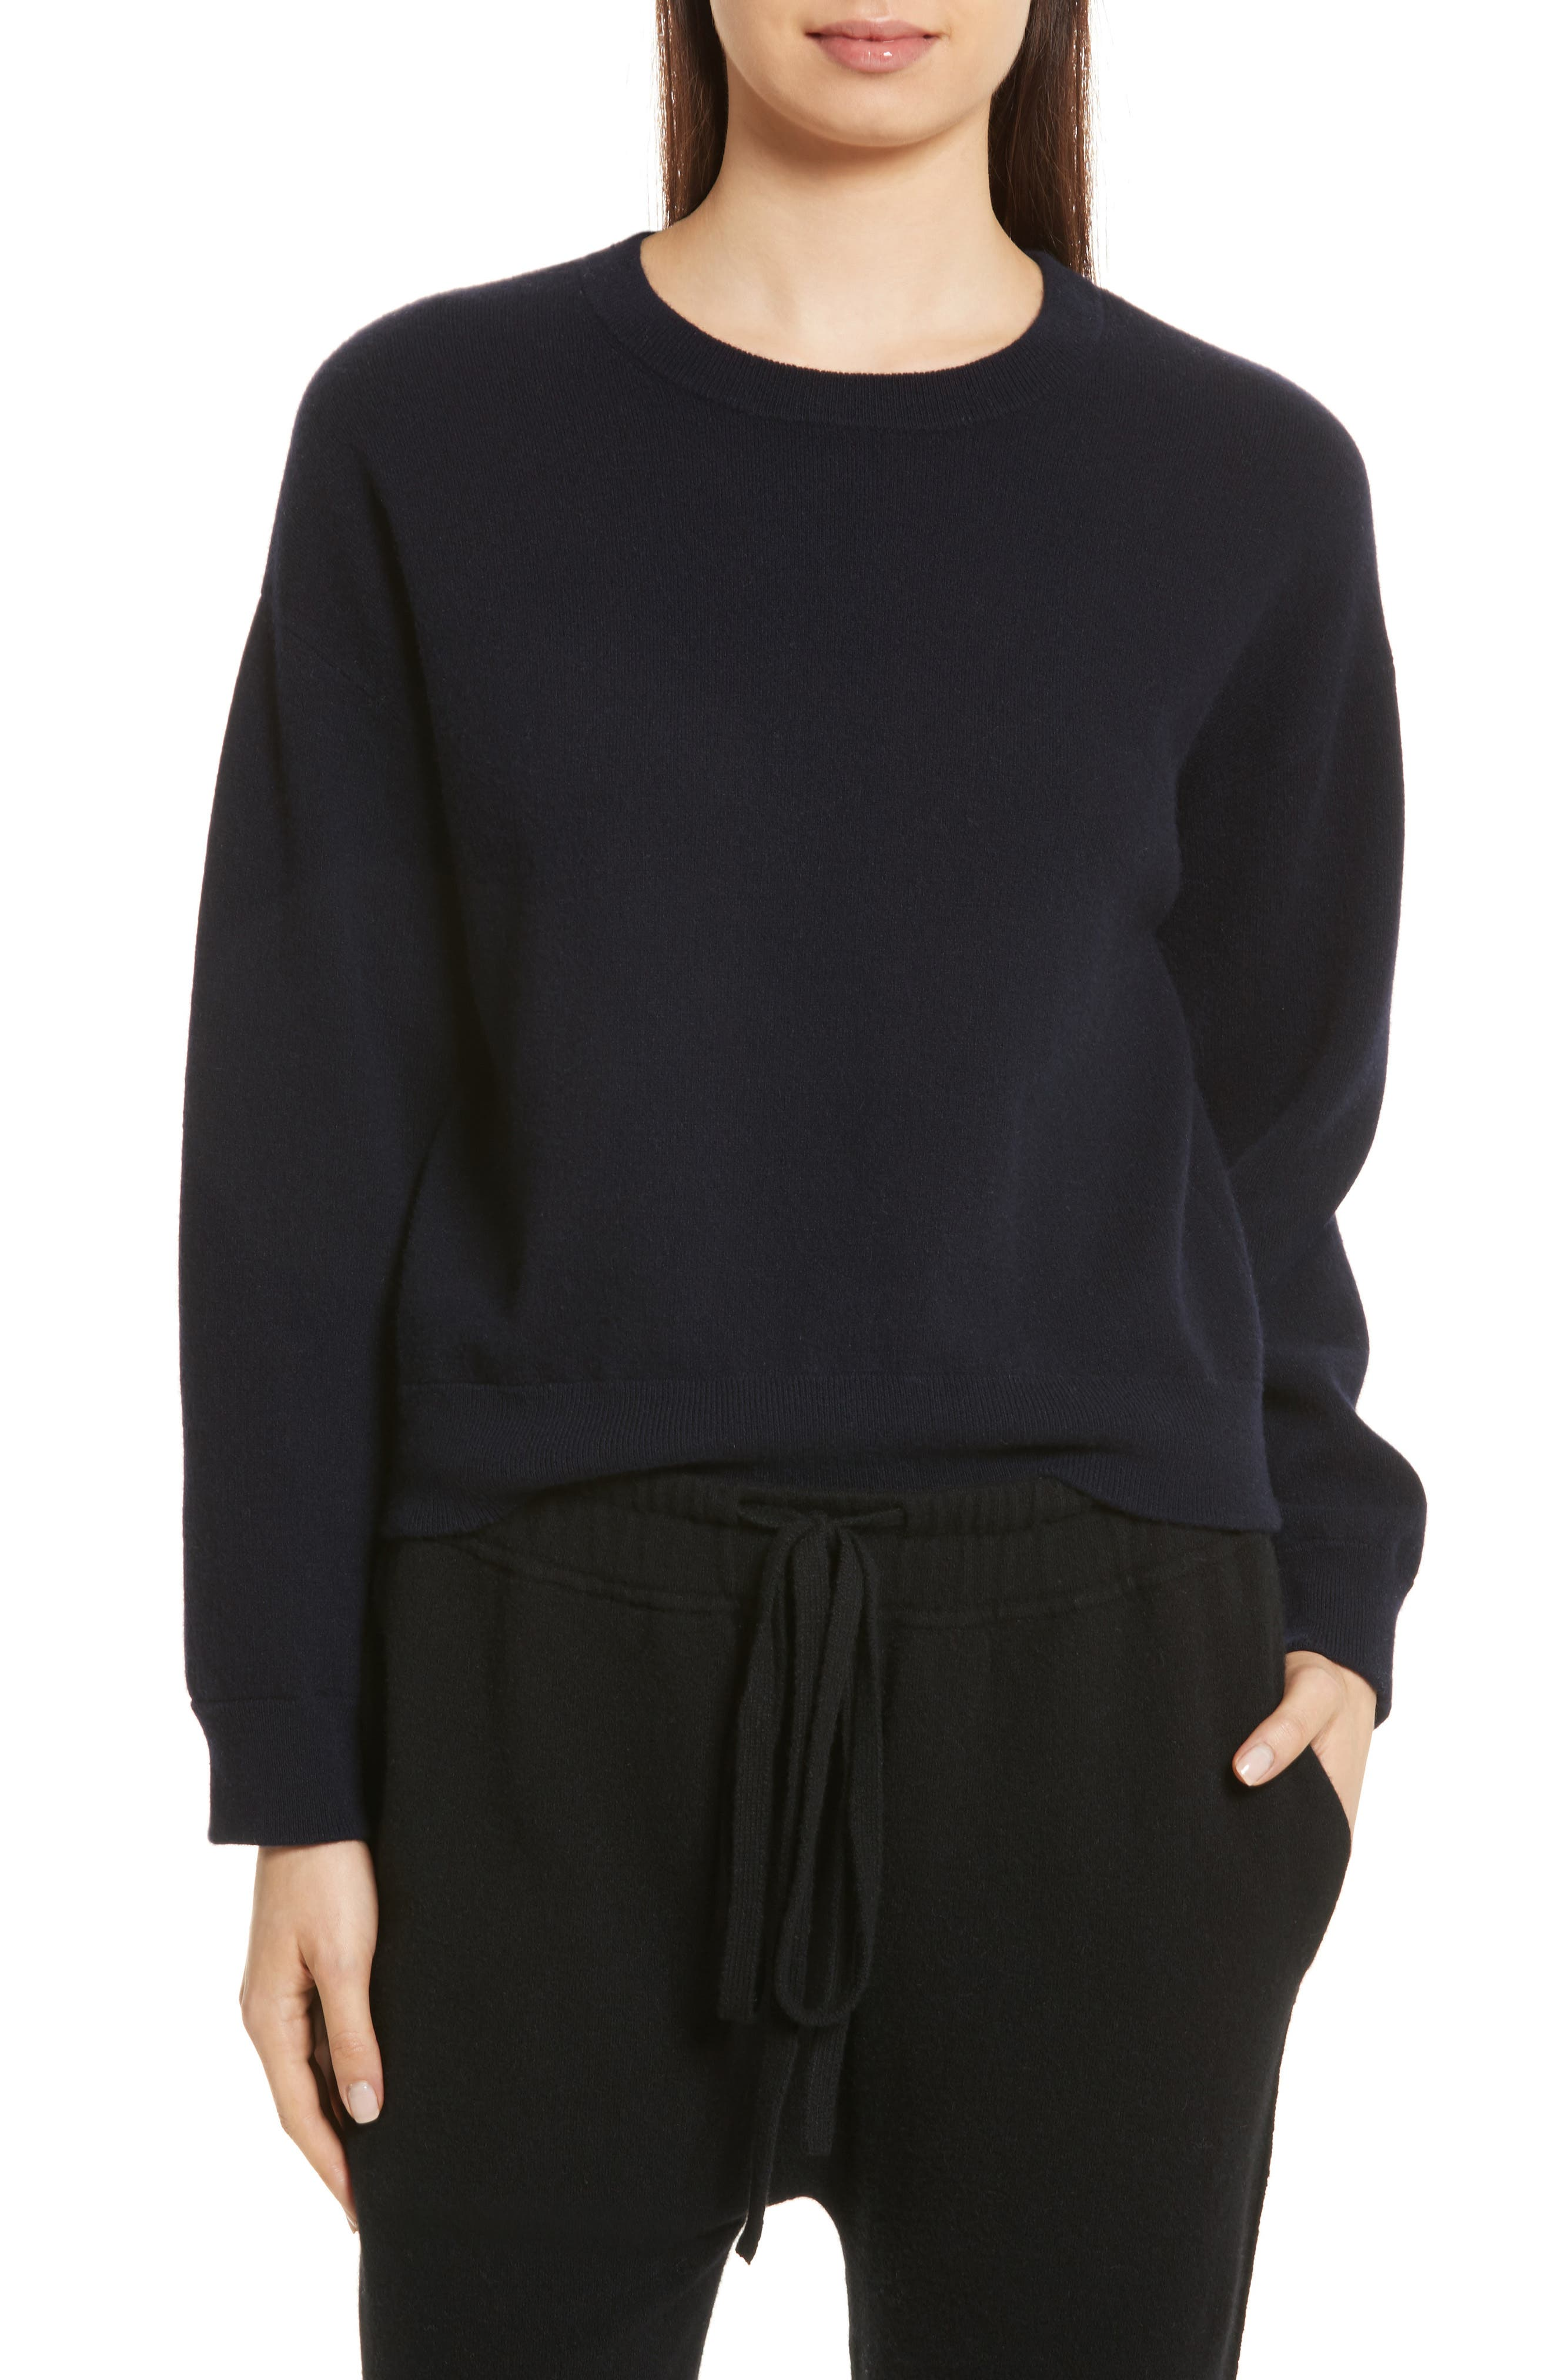 Main Image - Vince Double Layer Cashmere & Cotton Sweater